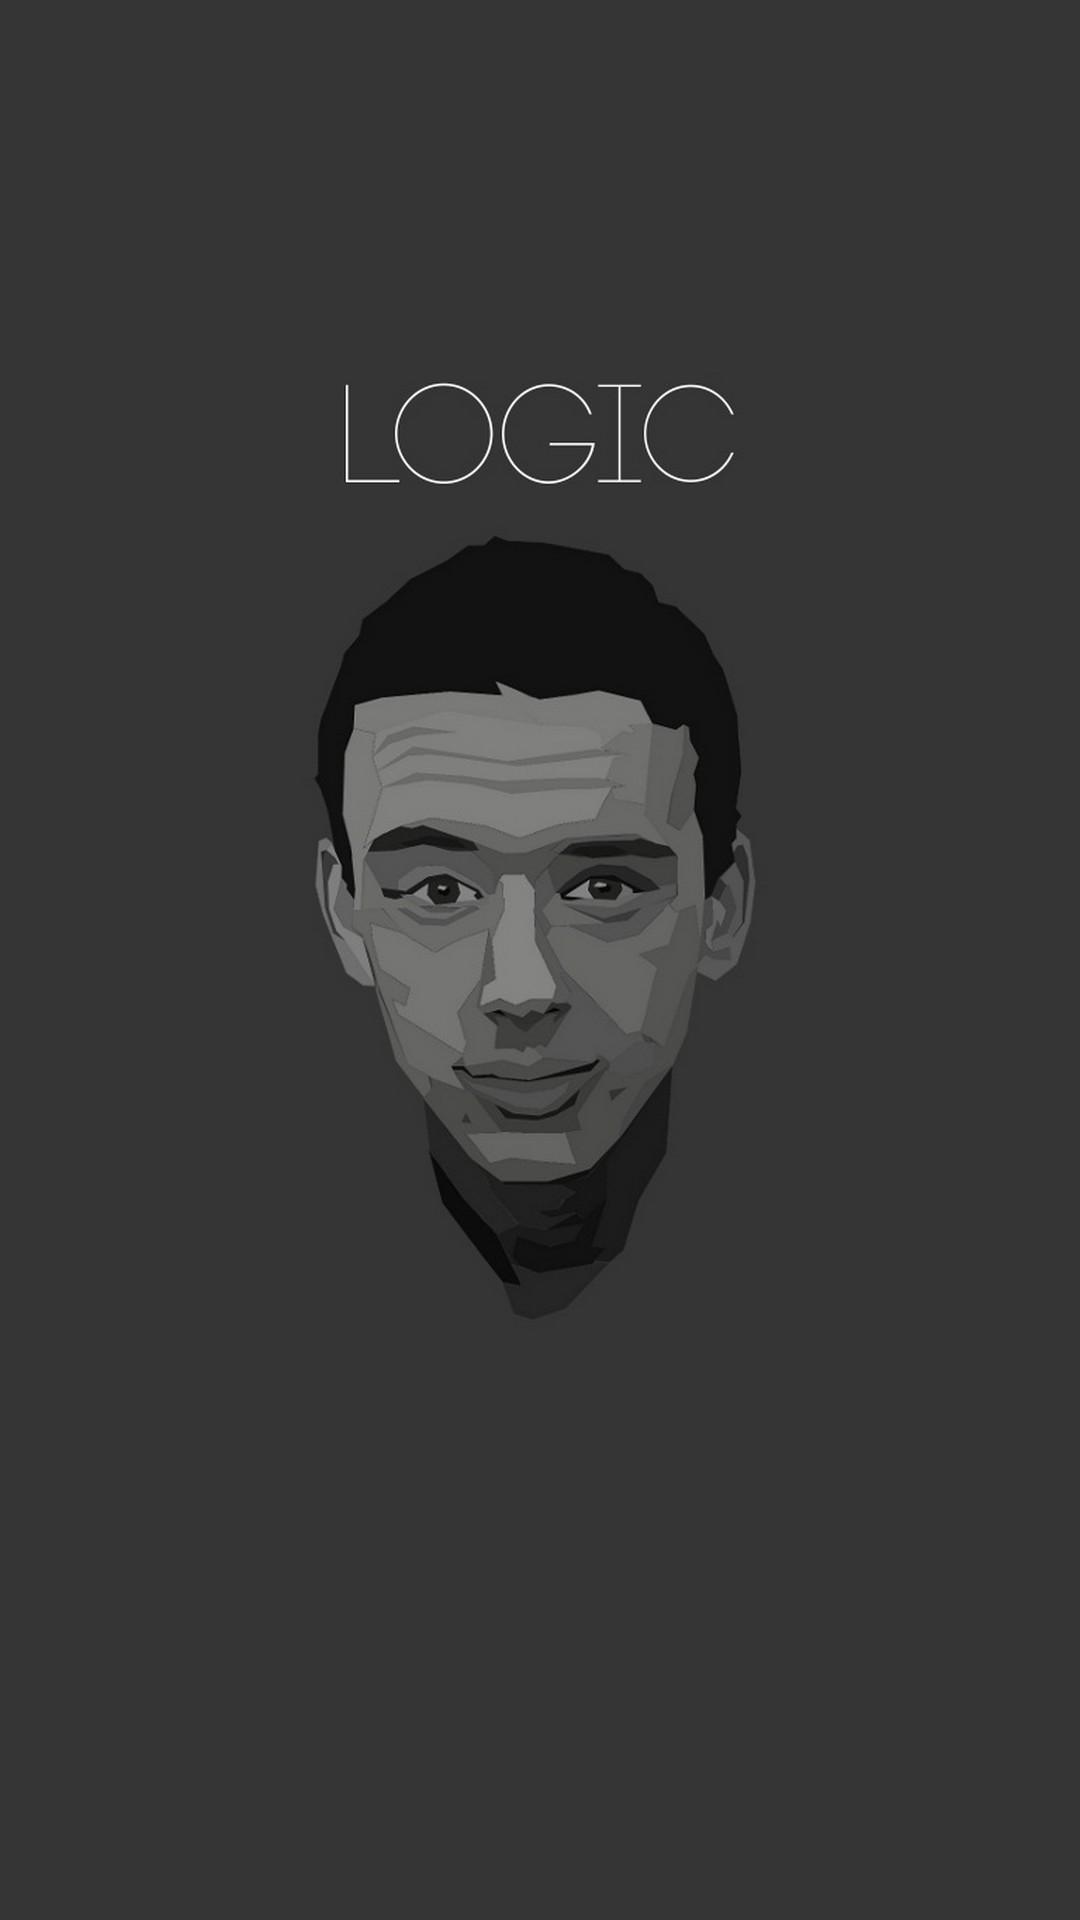 Logic wallpaper for iPhone